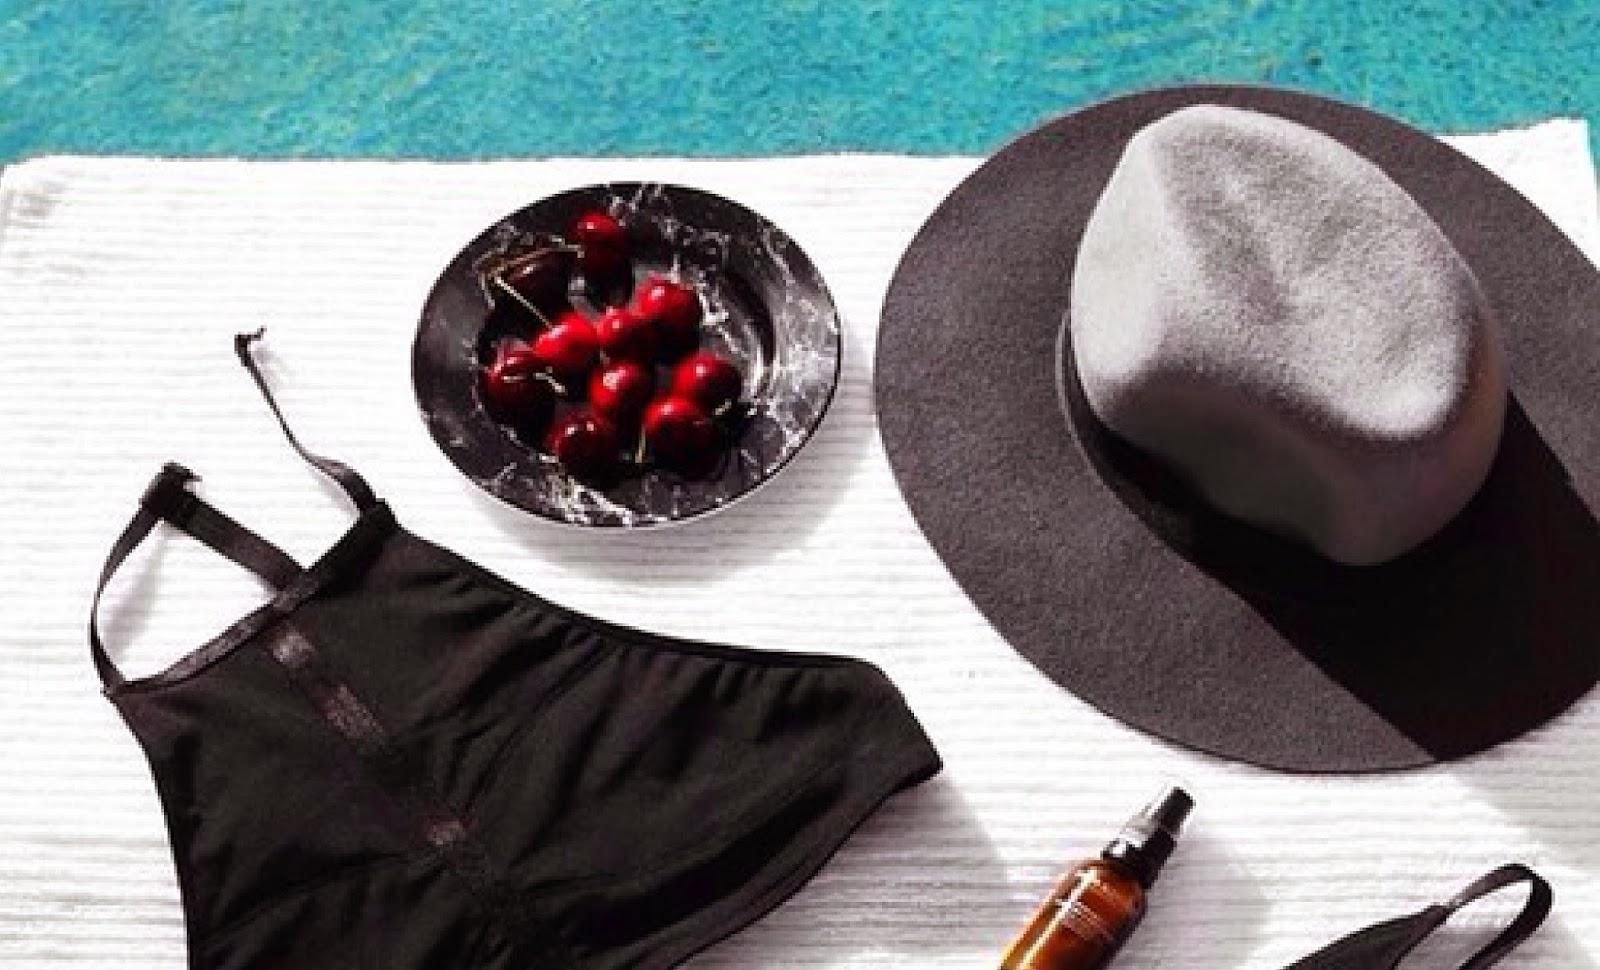 poolside flat lay off figure styling cherries